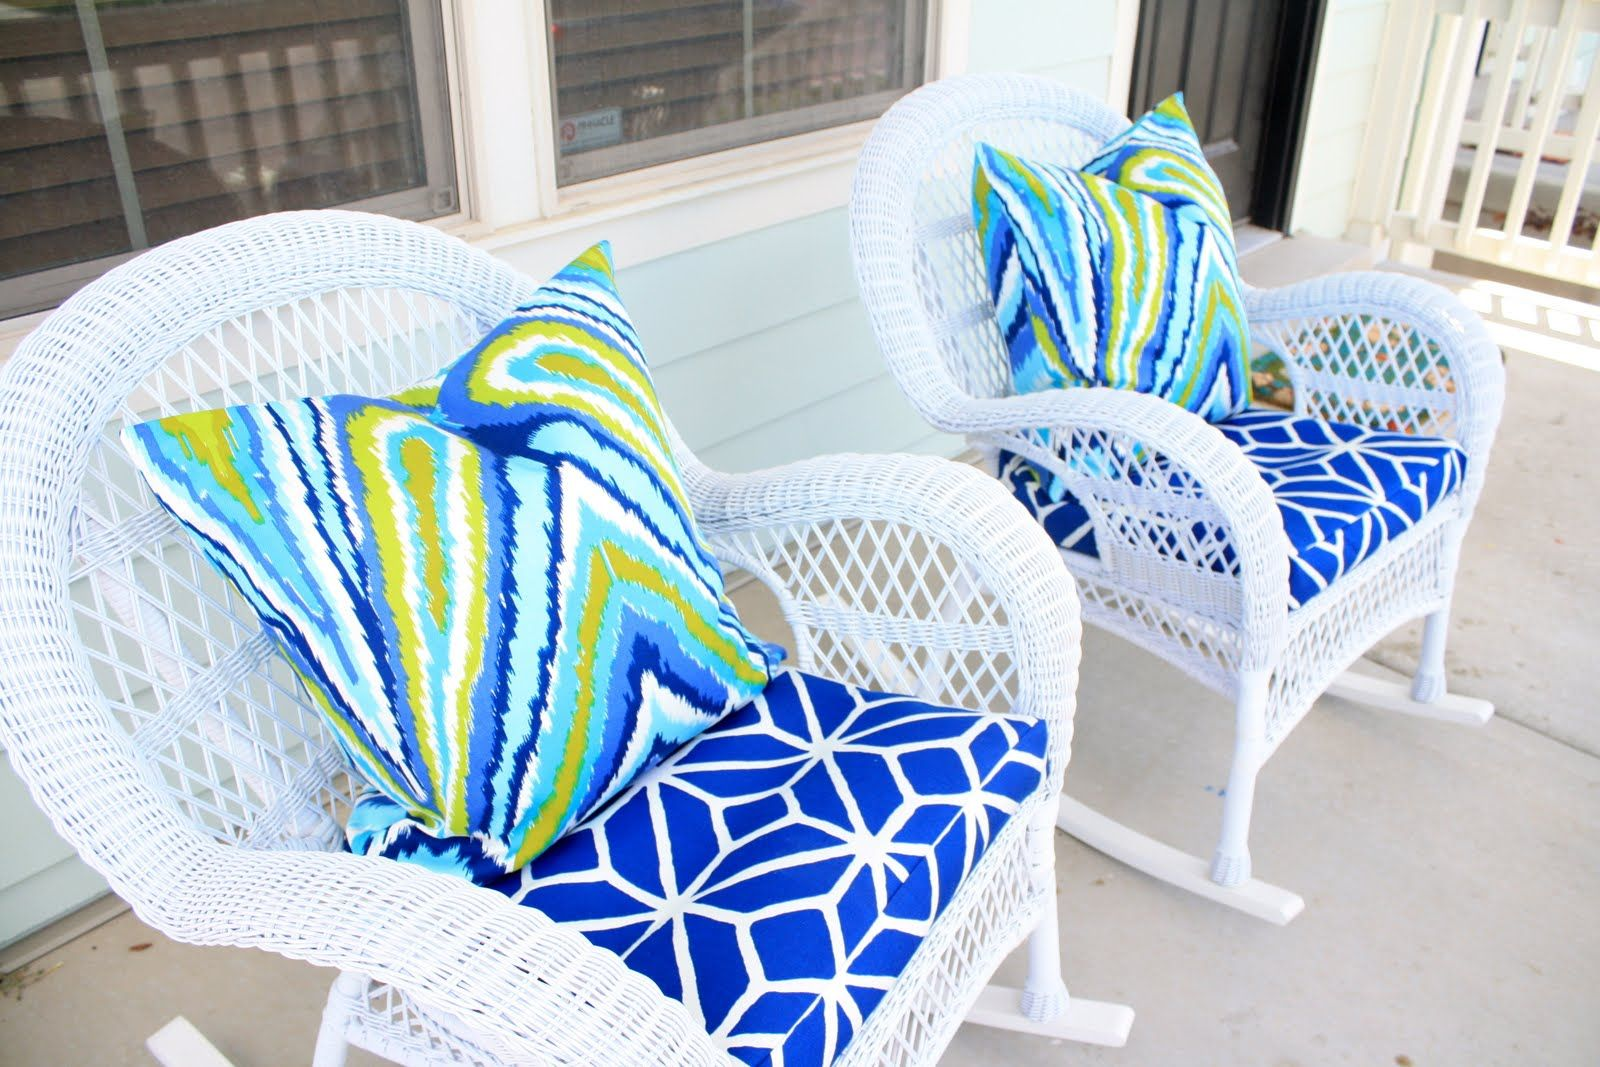 Wicker Rocking Chair Pier One Gaiam Exercise Ball My Little Beach House Pinterest